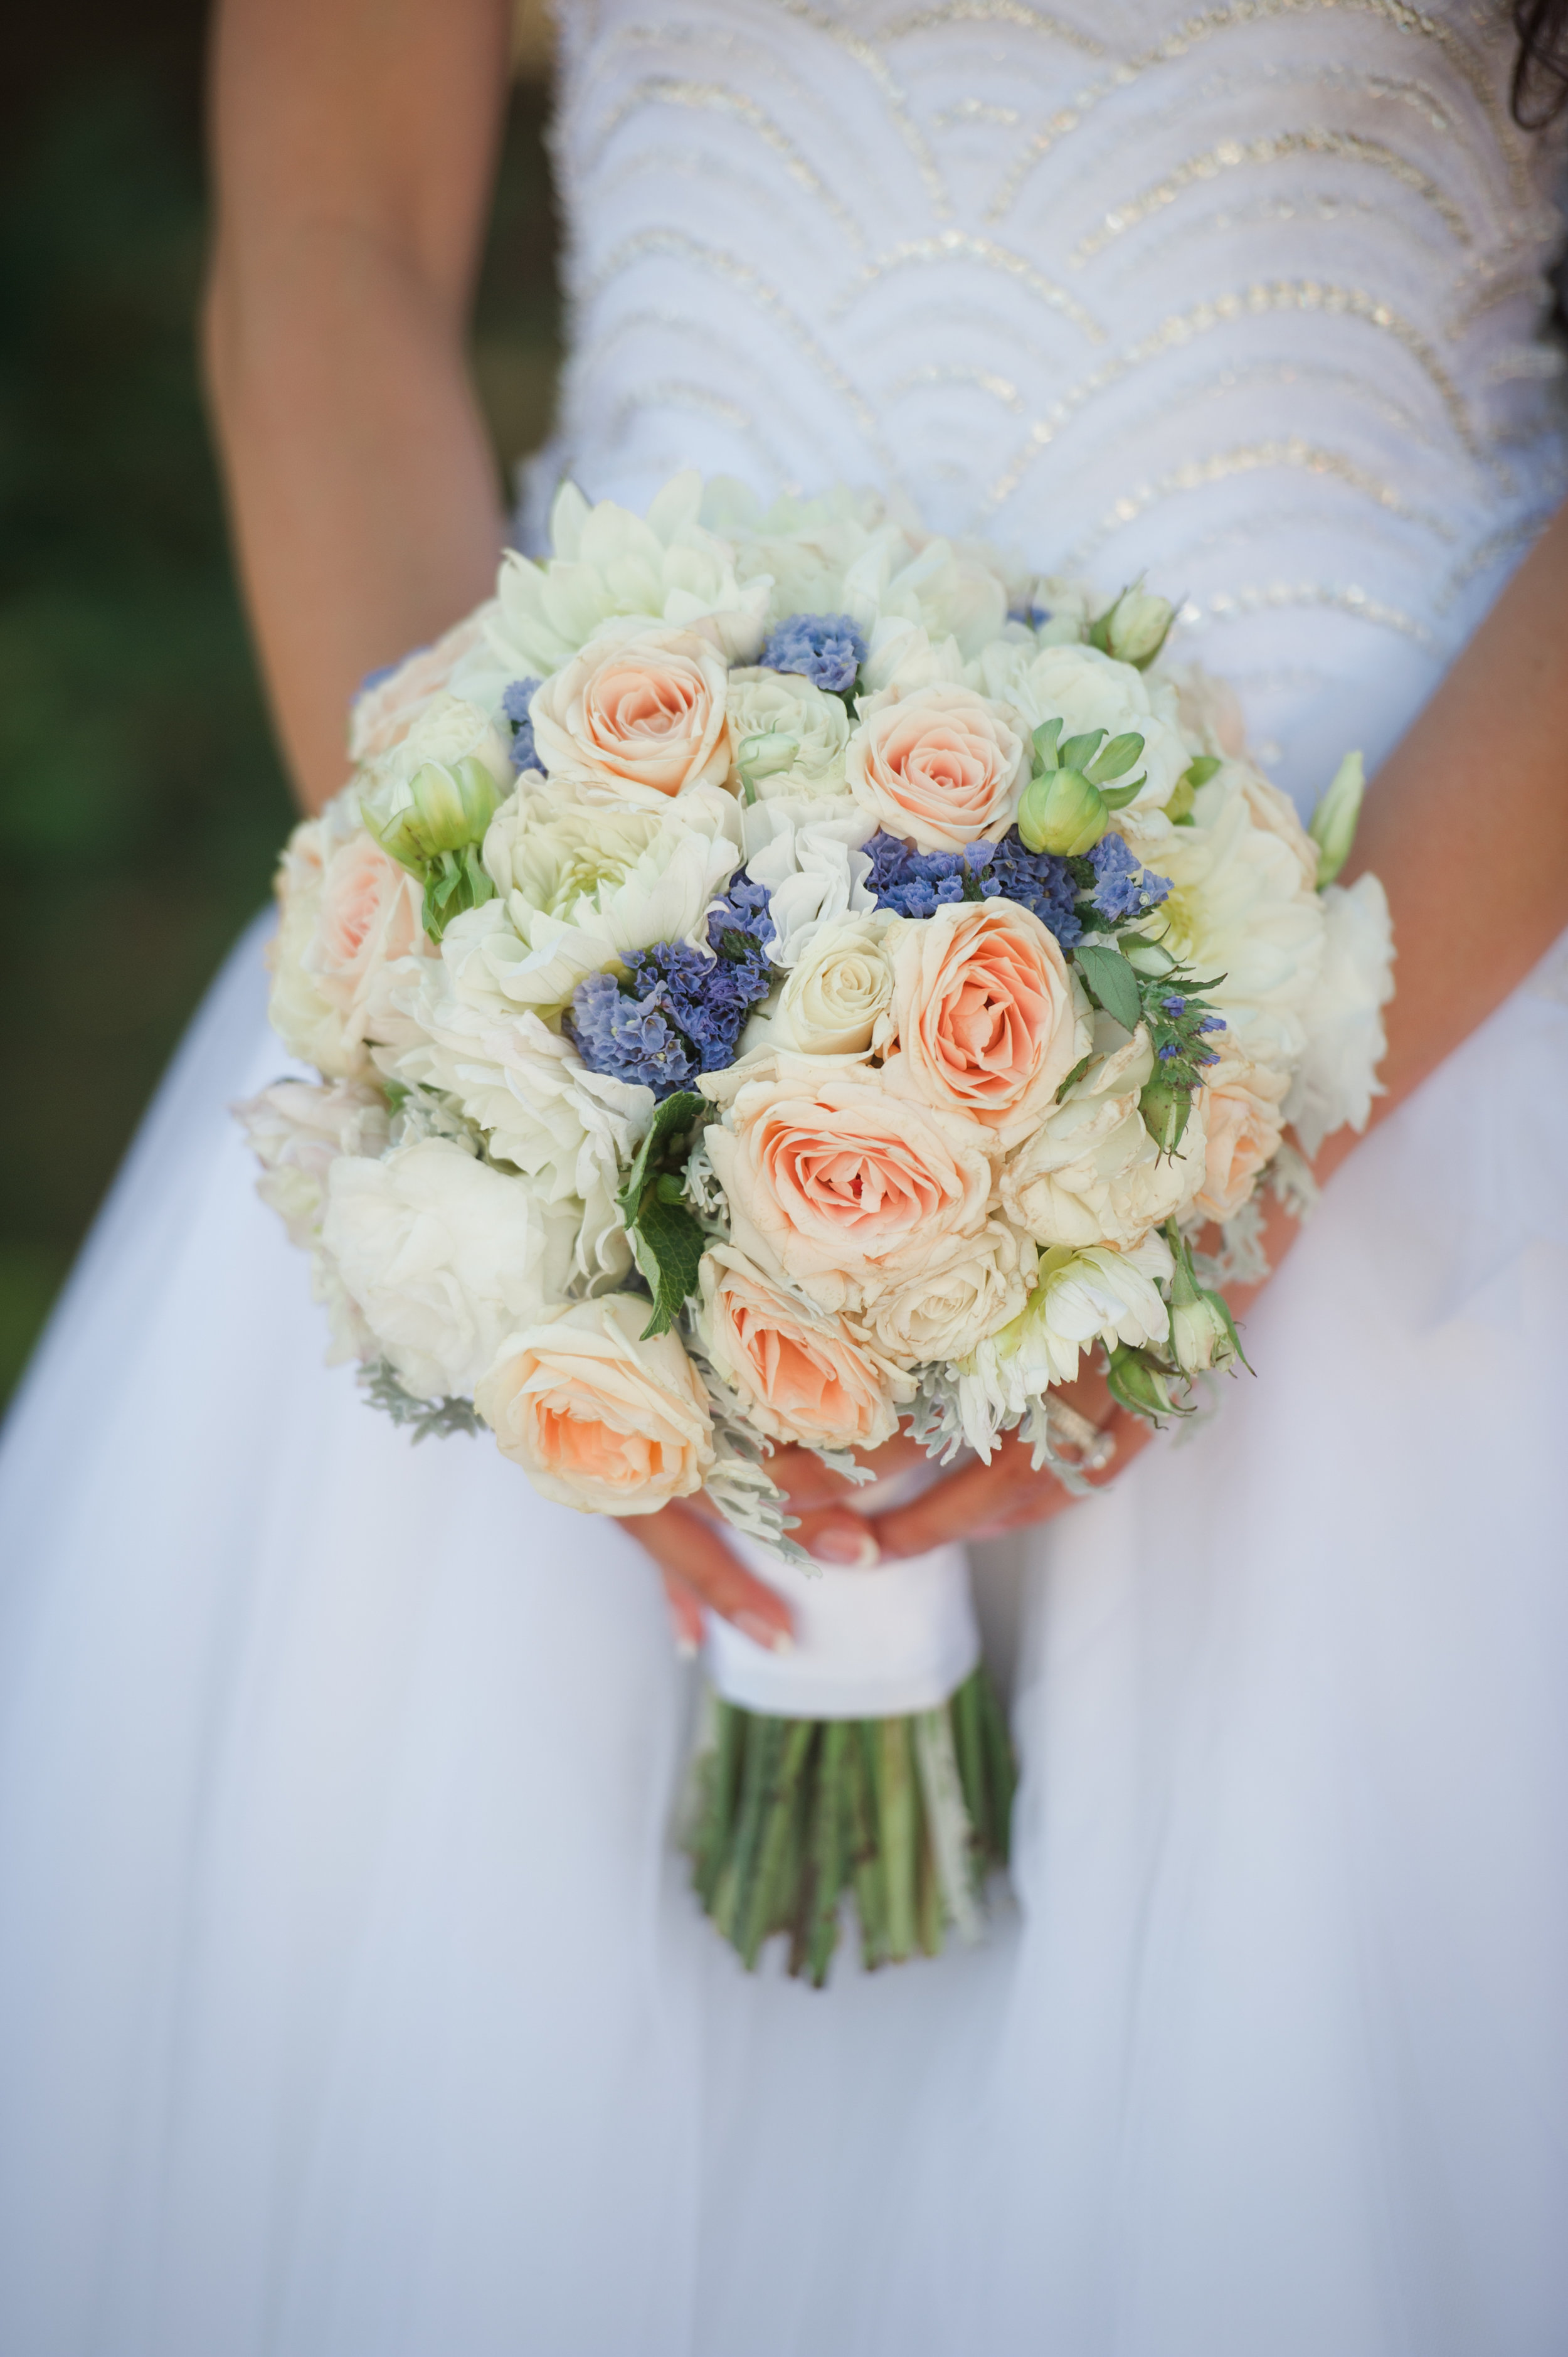 bride_bouquet_sydney_wedding_florist.JPG